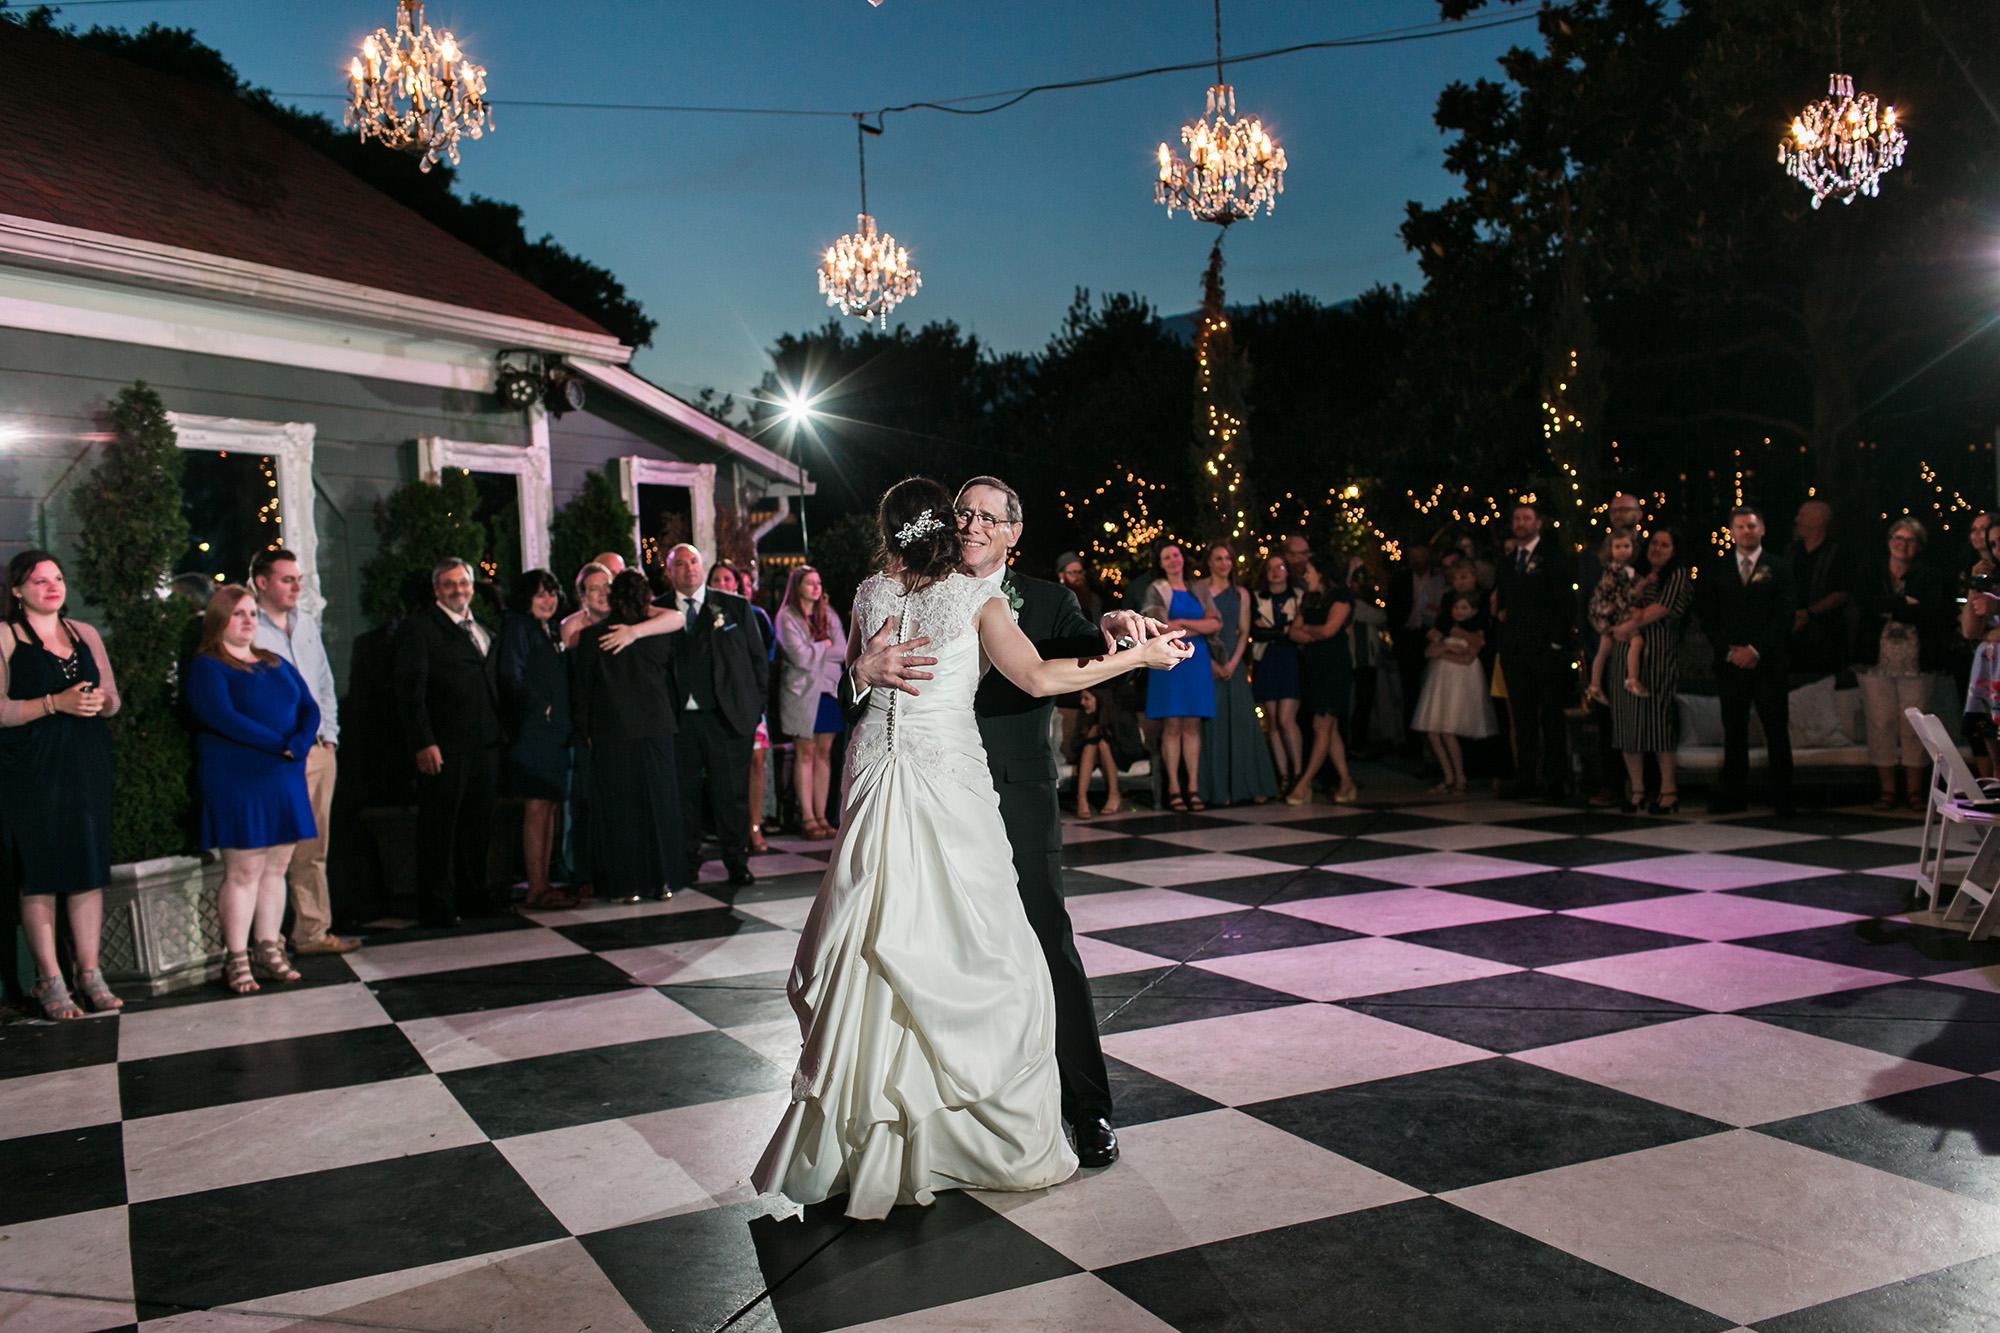 associate-photographer-christmas-house-wedding-carrie-vines-0009.jpg